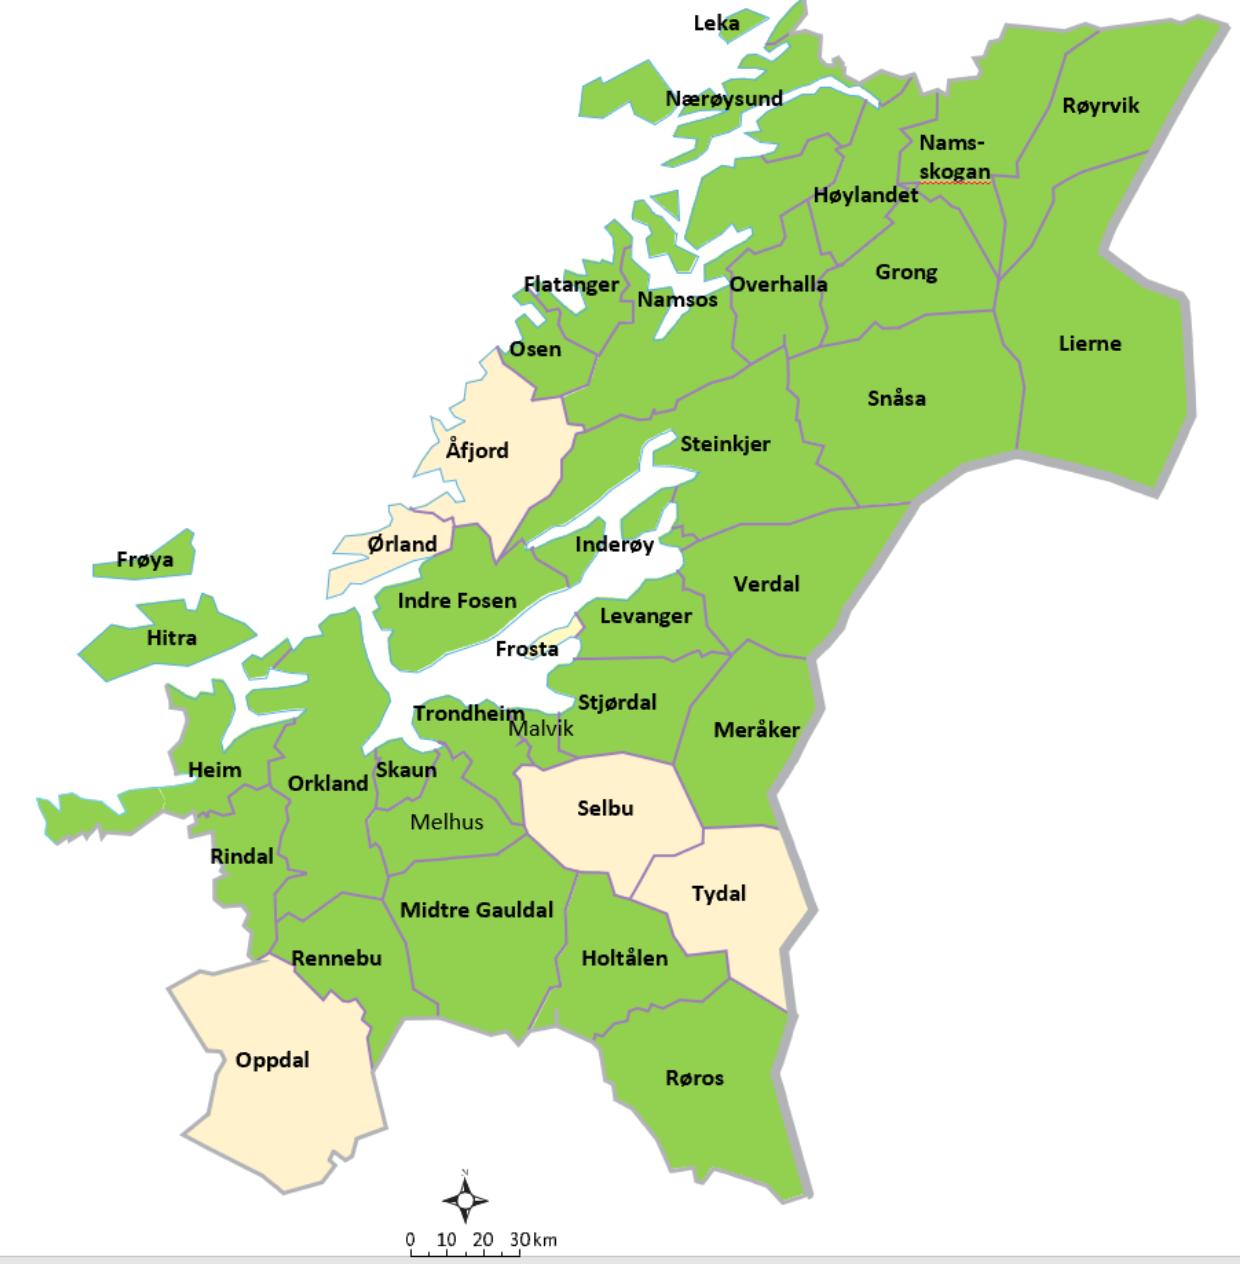 Trondelag medlemskommuner